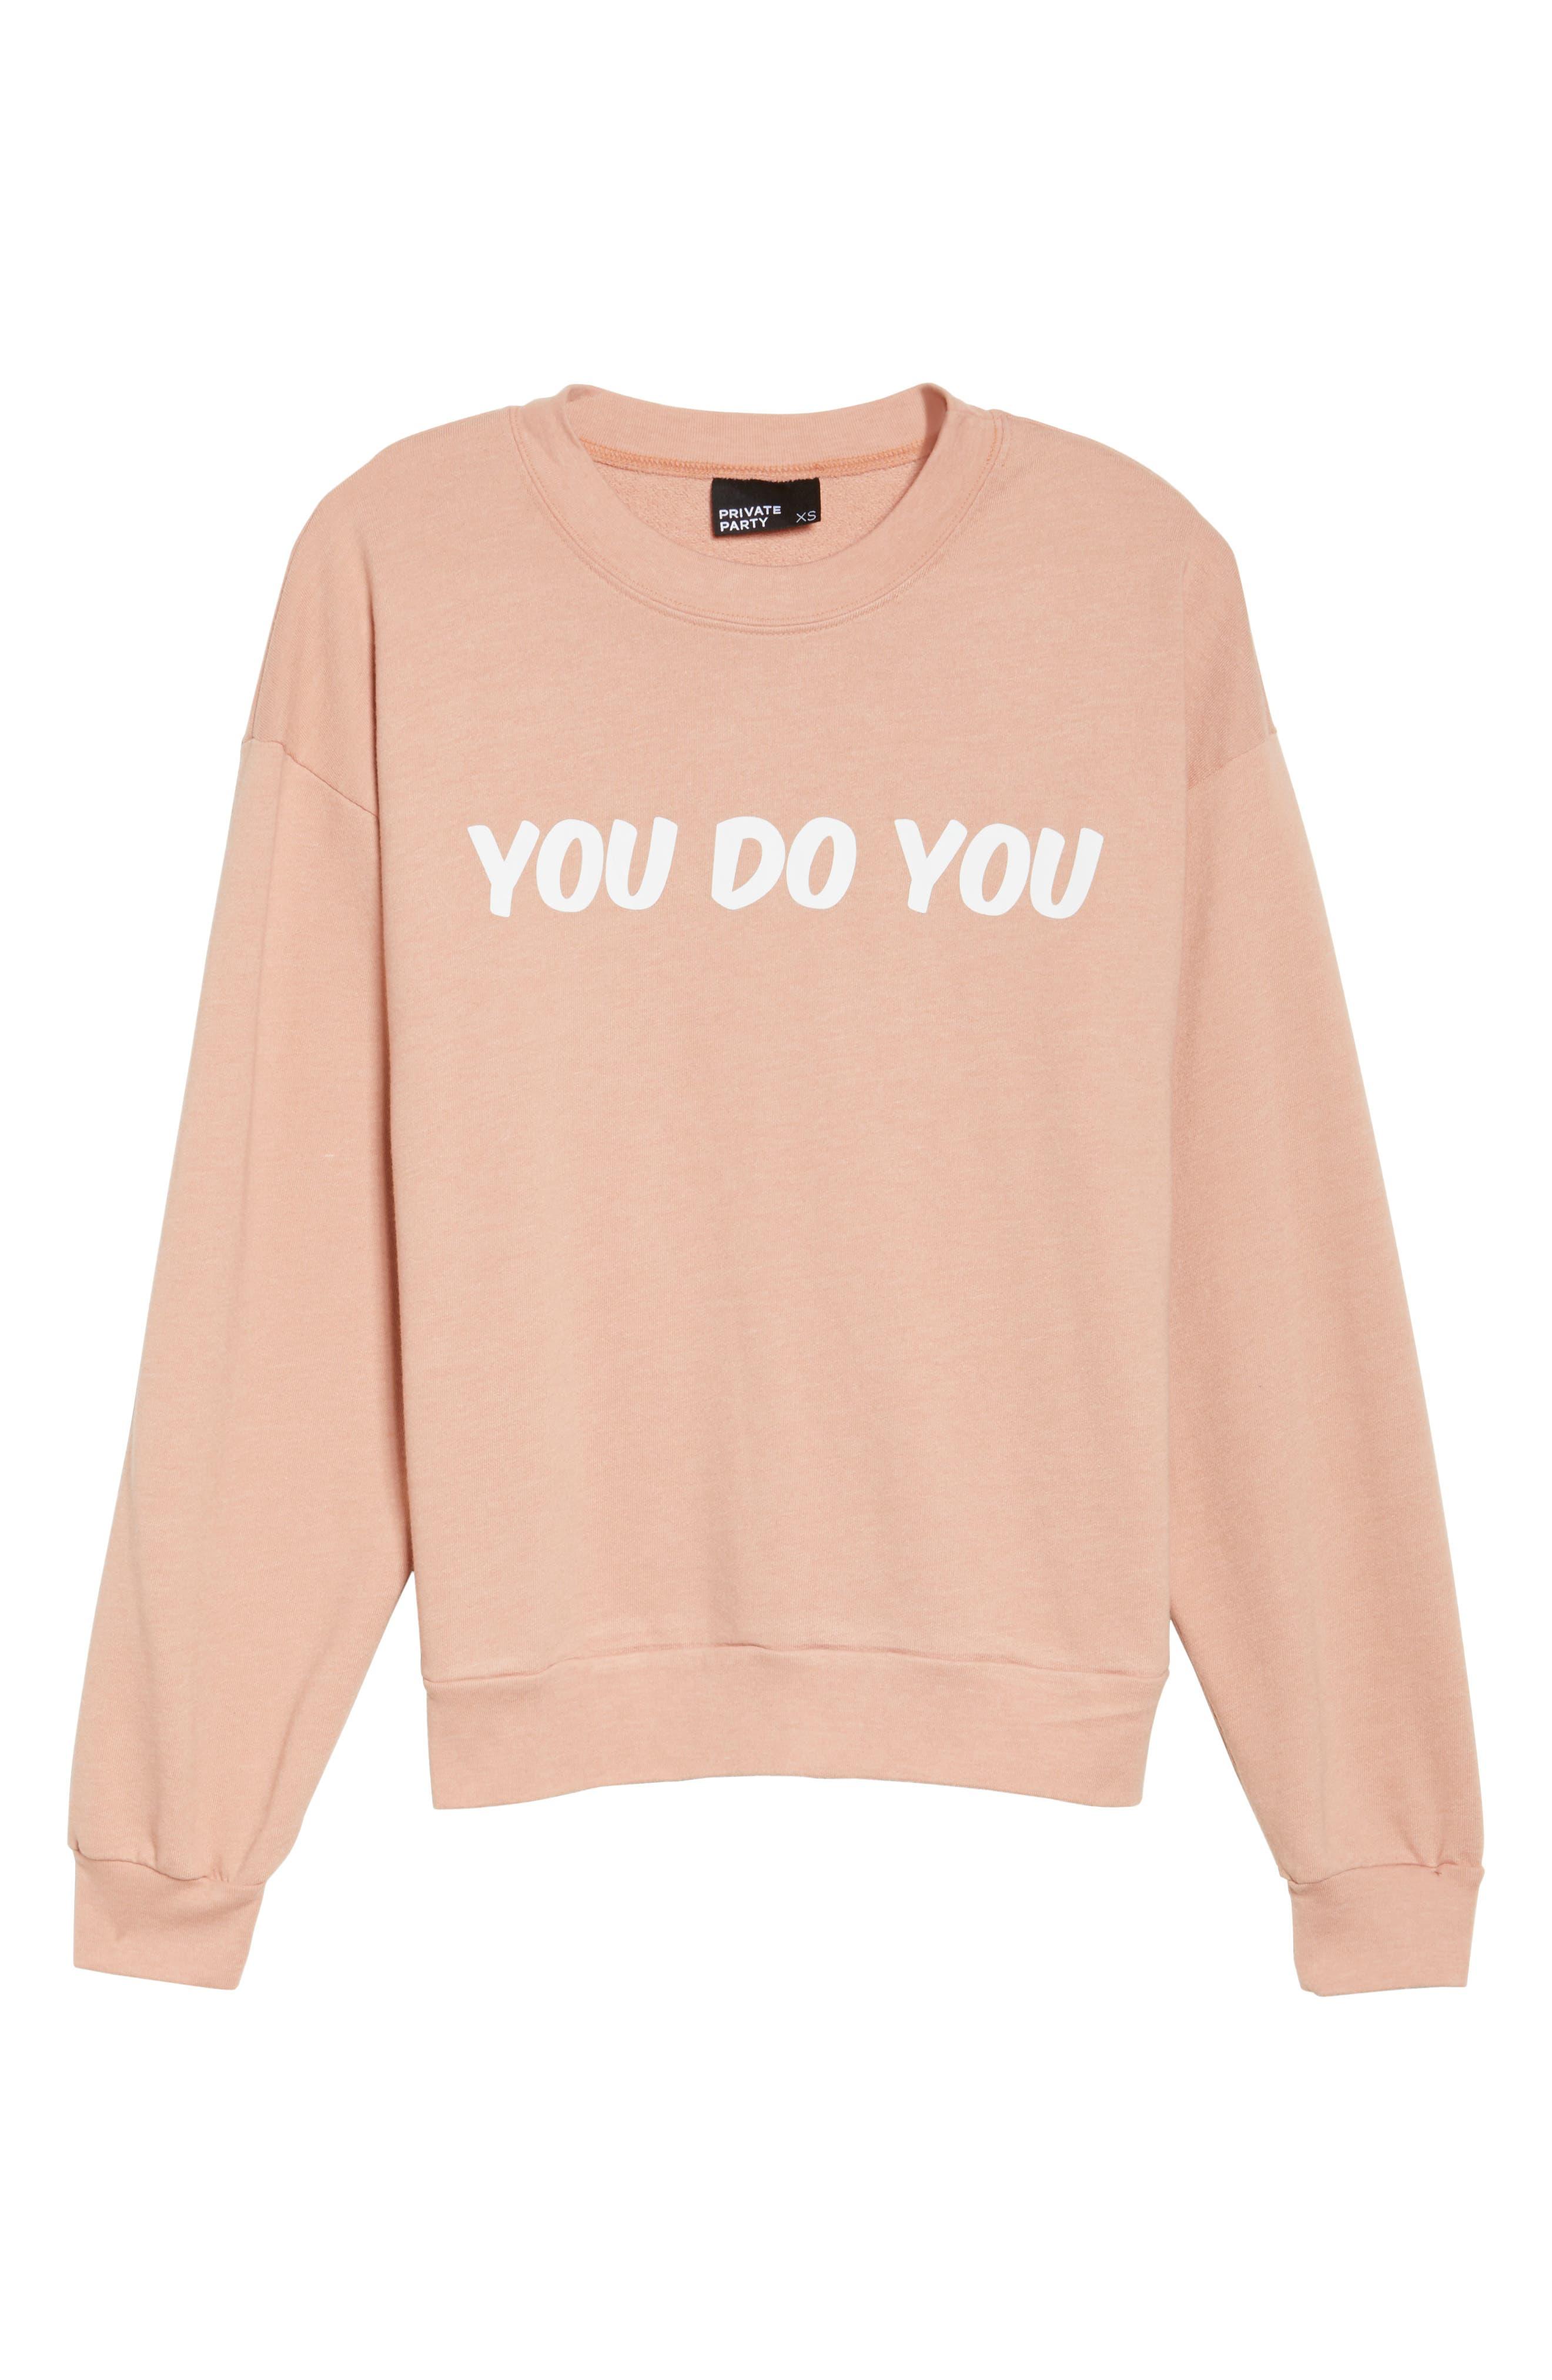 You Do You Sweatshirt,                             Alternate thumbnail 7, color,